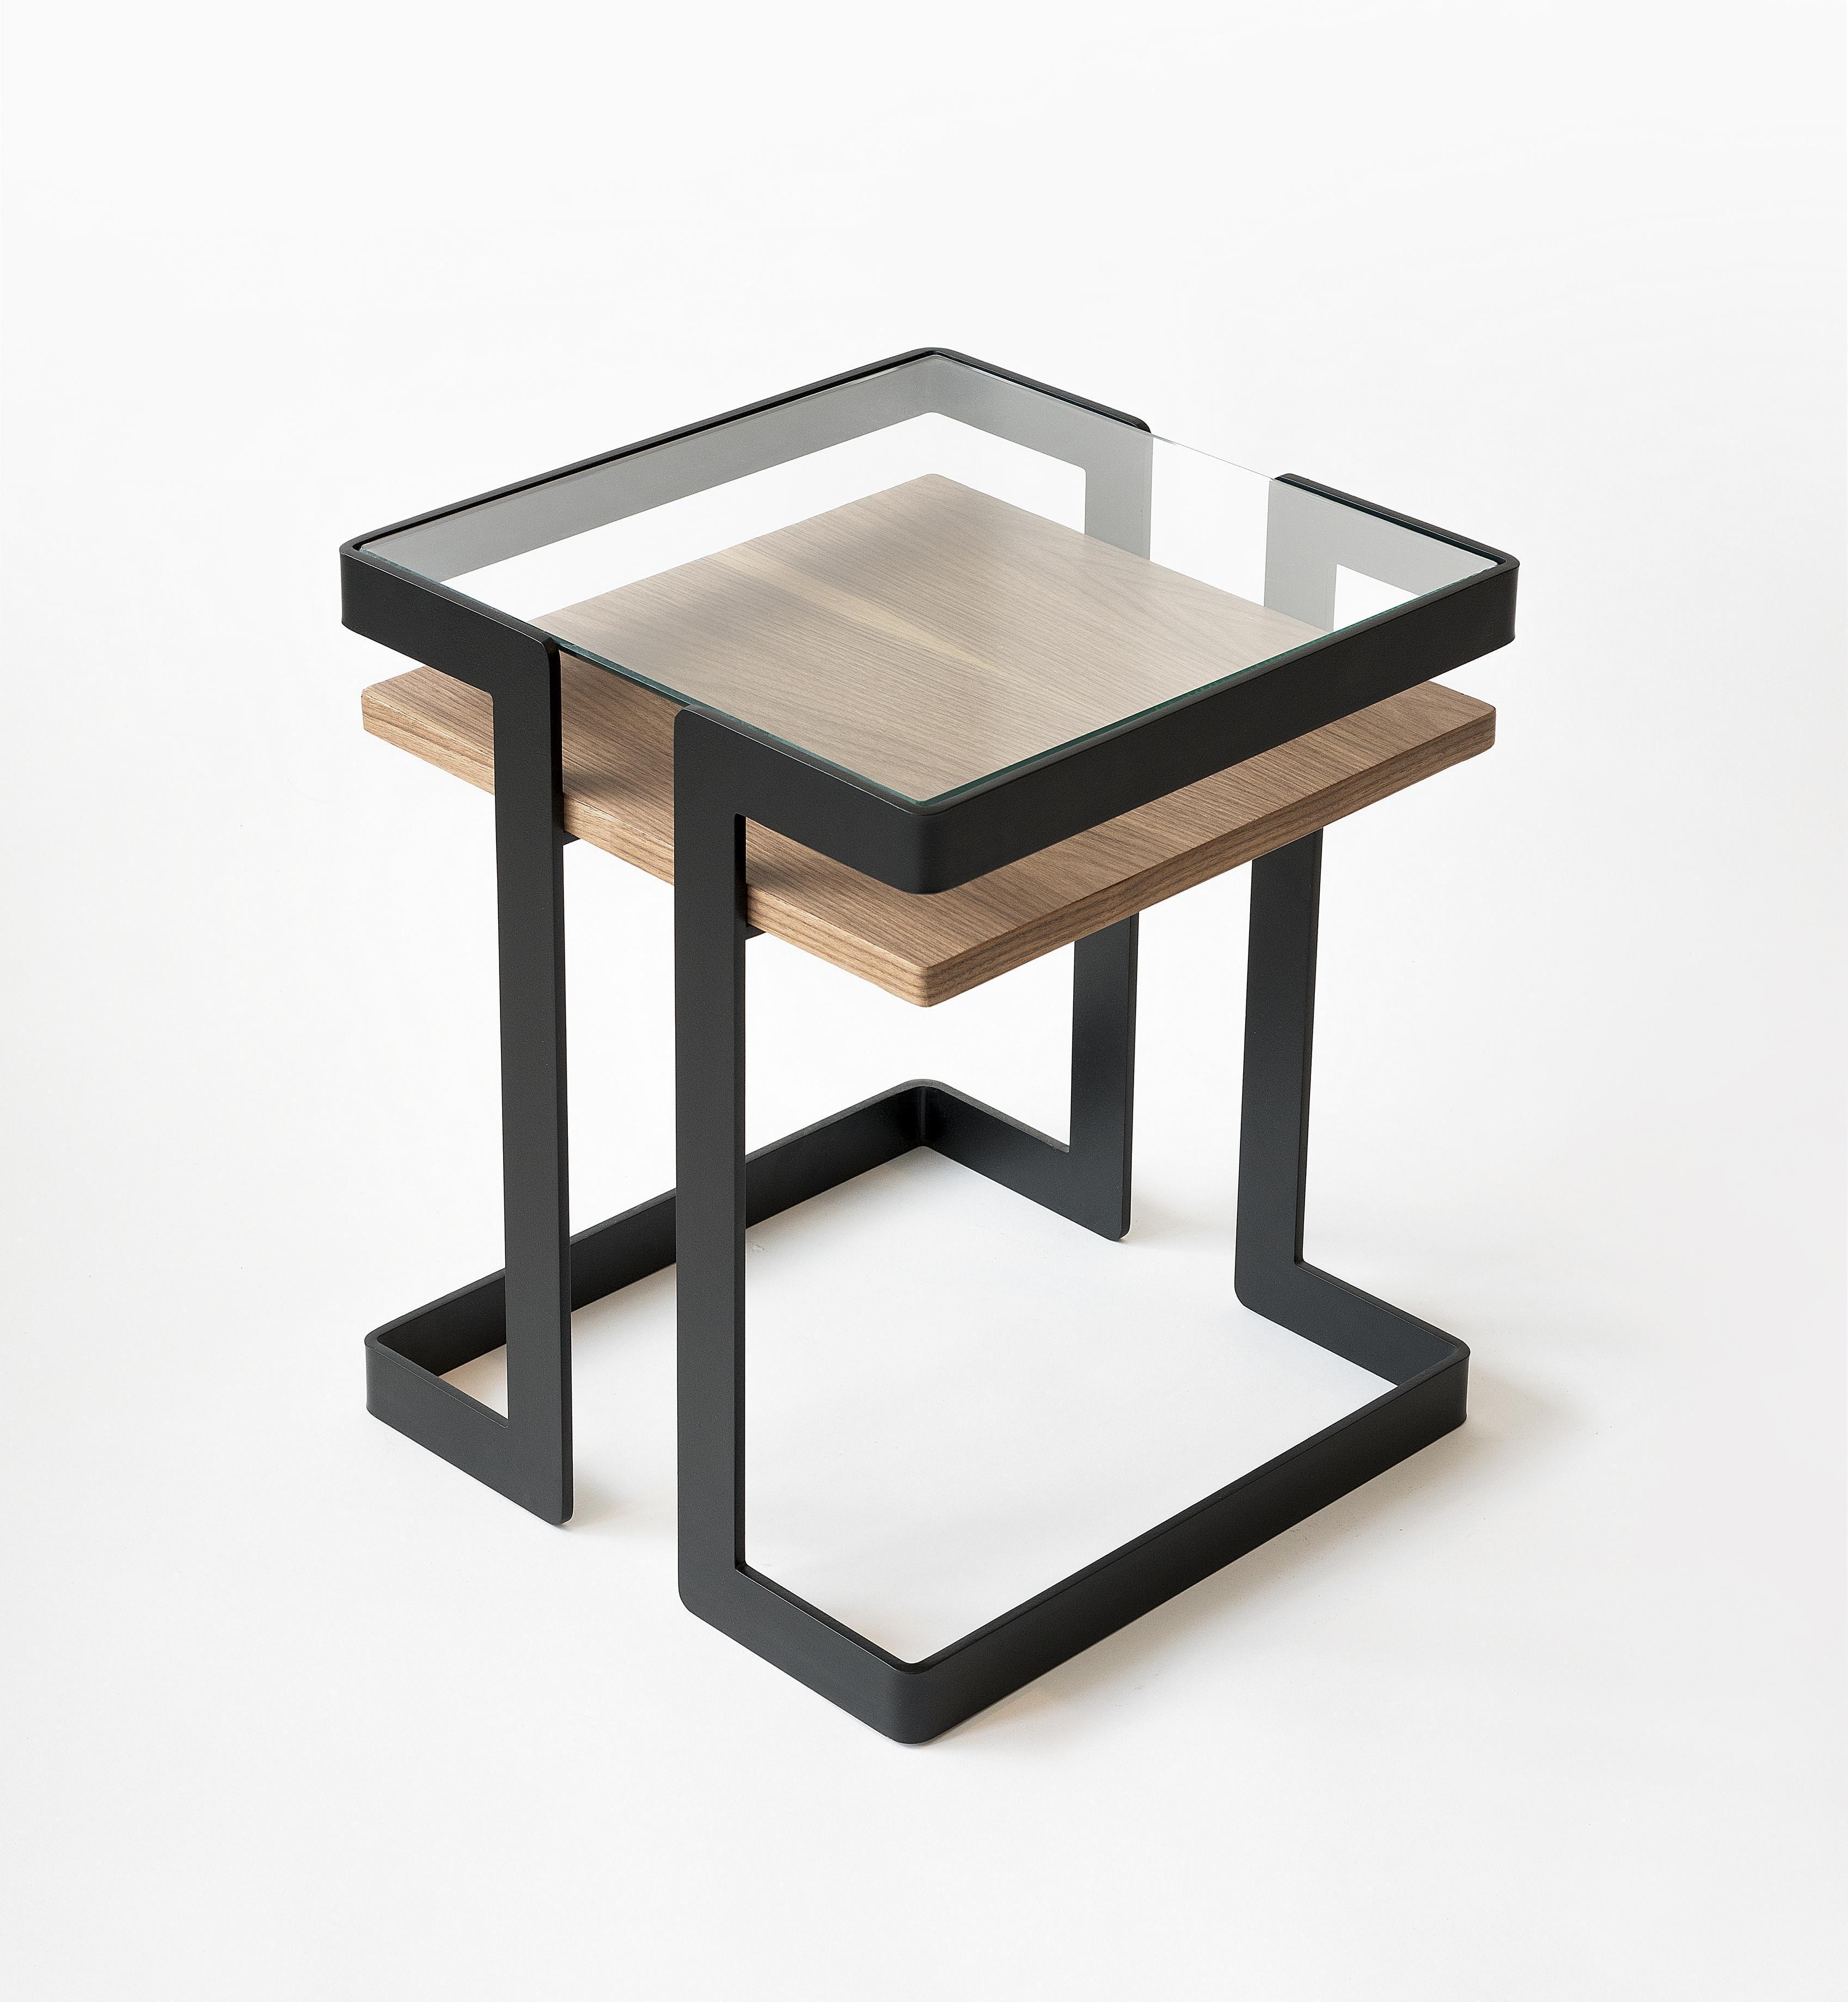 Stunning Coffee Table Design Ideas 29 Tea Table Design Contemporary Coffee Table Metal Furniture Design [ 1500 x 916 Pixel ]